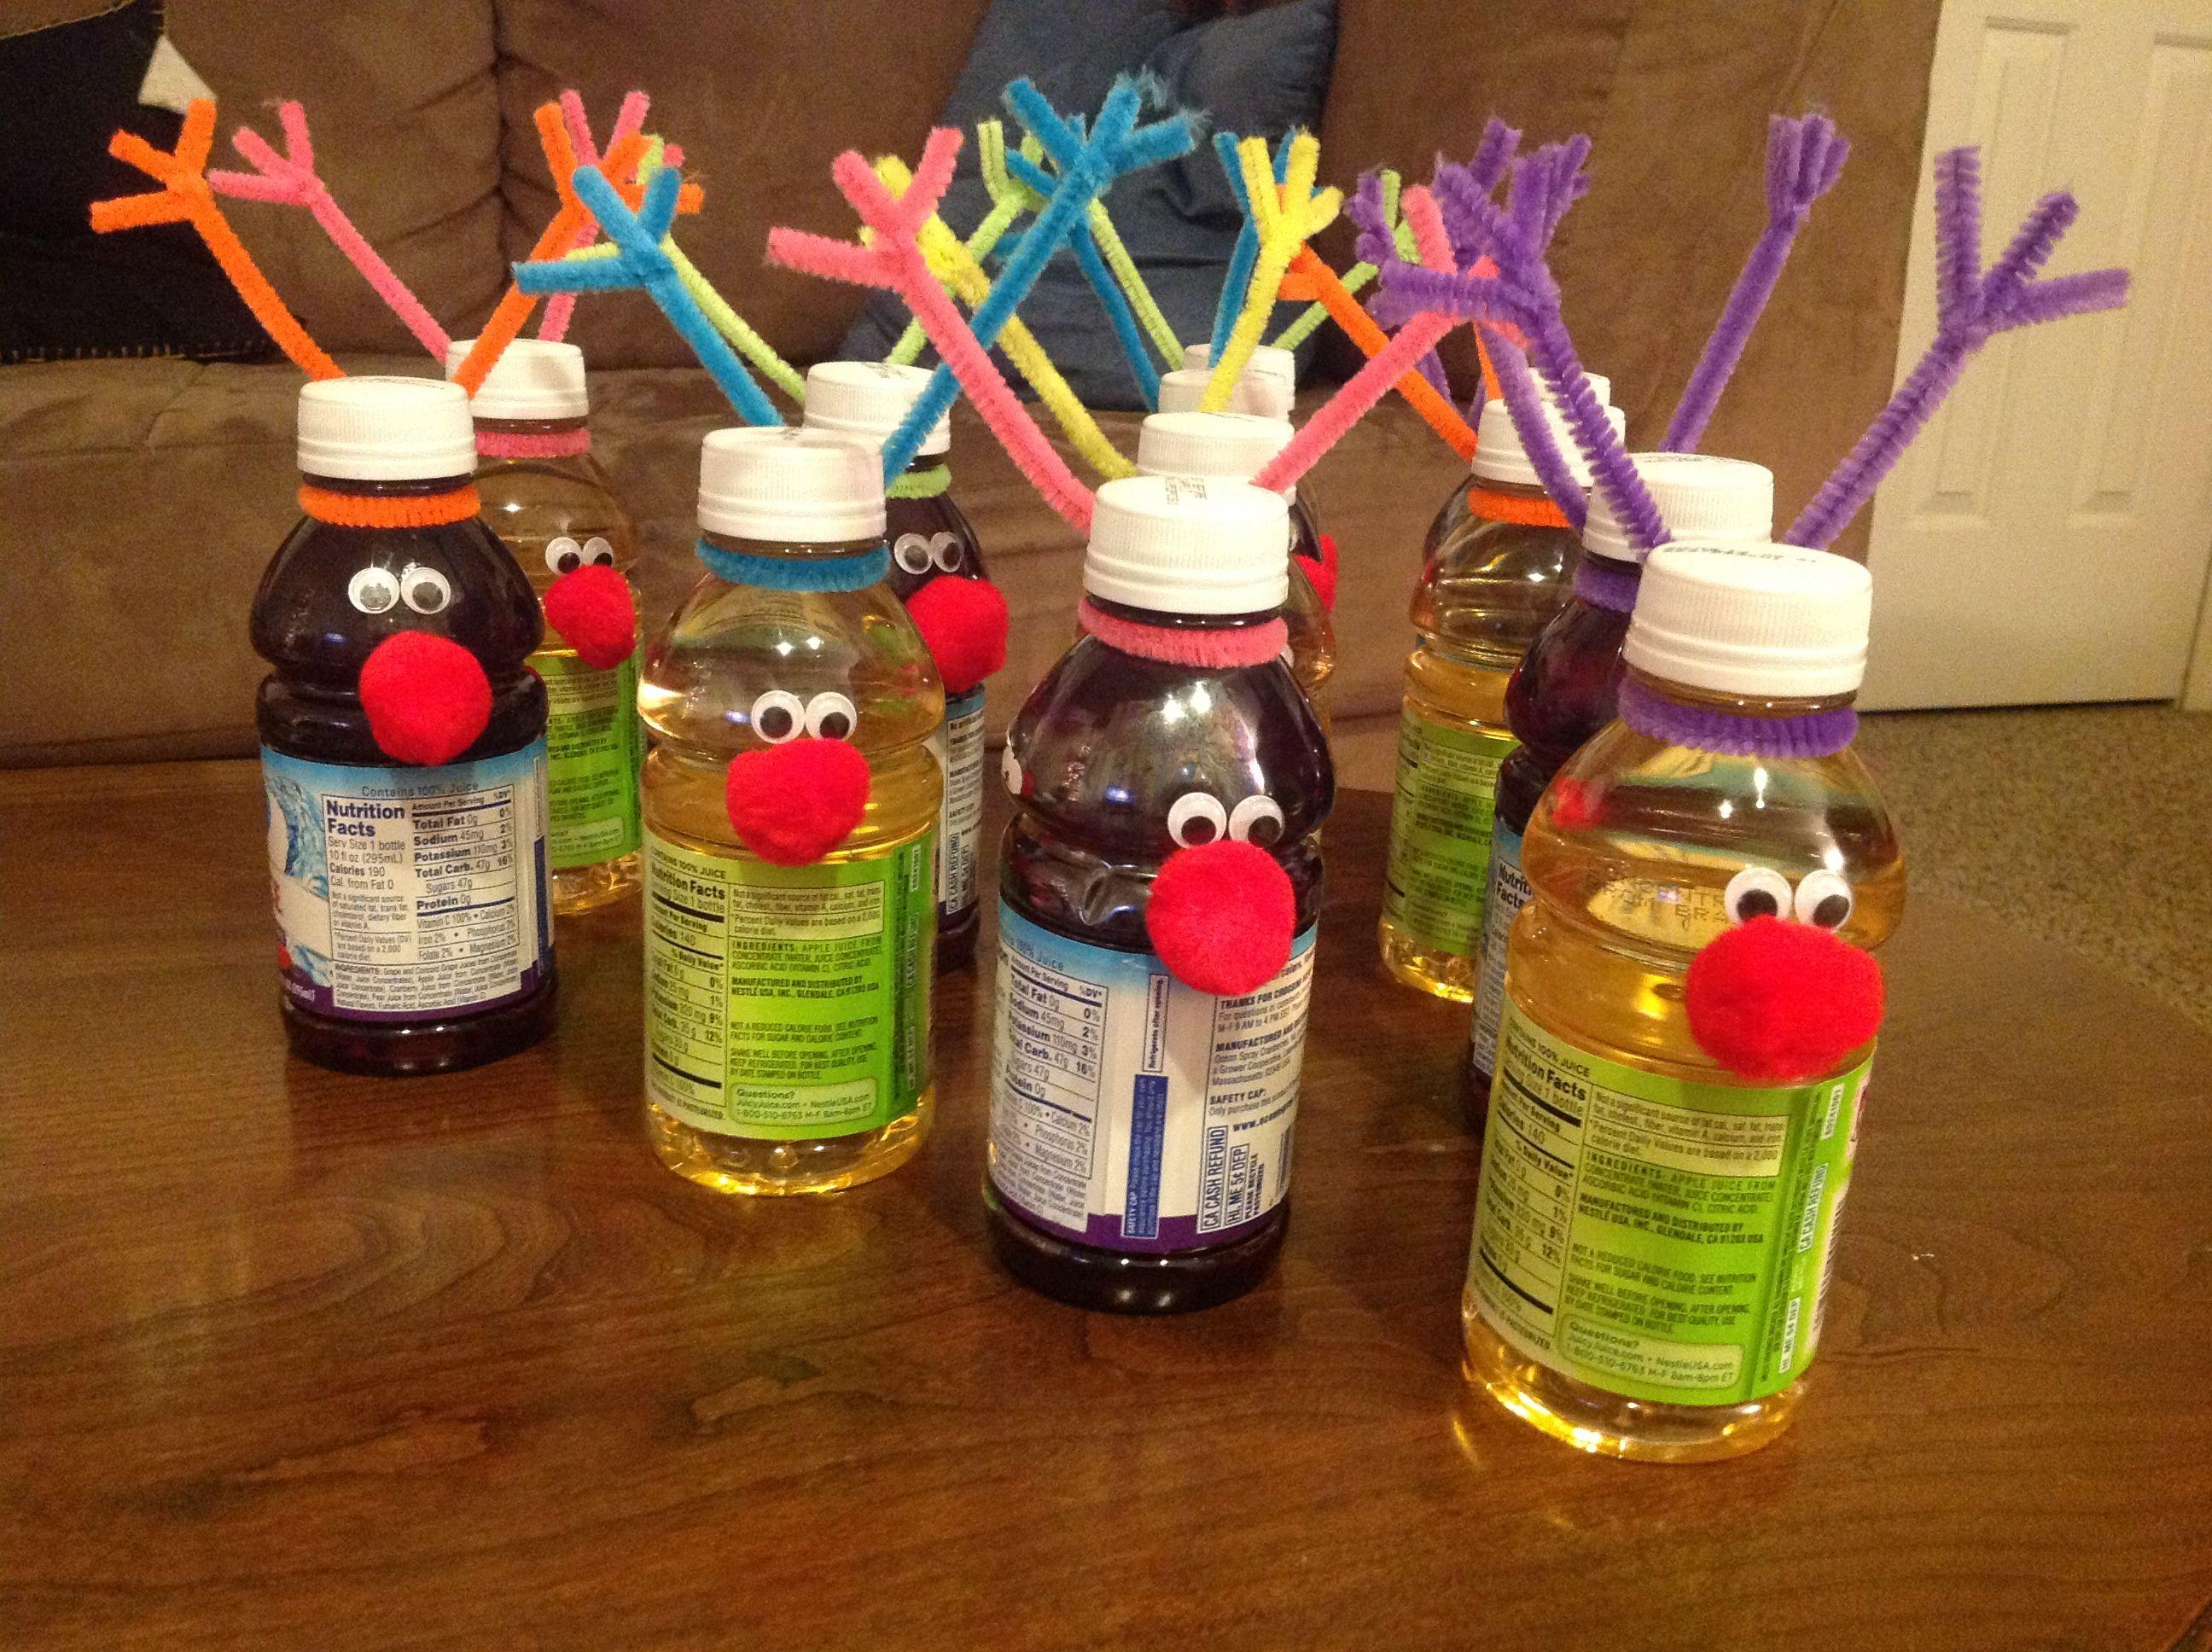 Reindeer Juice Bottles For Sanae S School Christmas Party Christmas Party Kids Gifts Goodies Juice 크리스마스